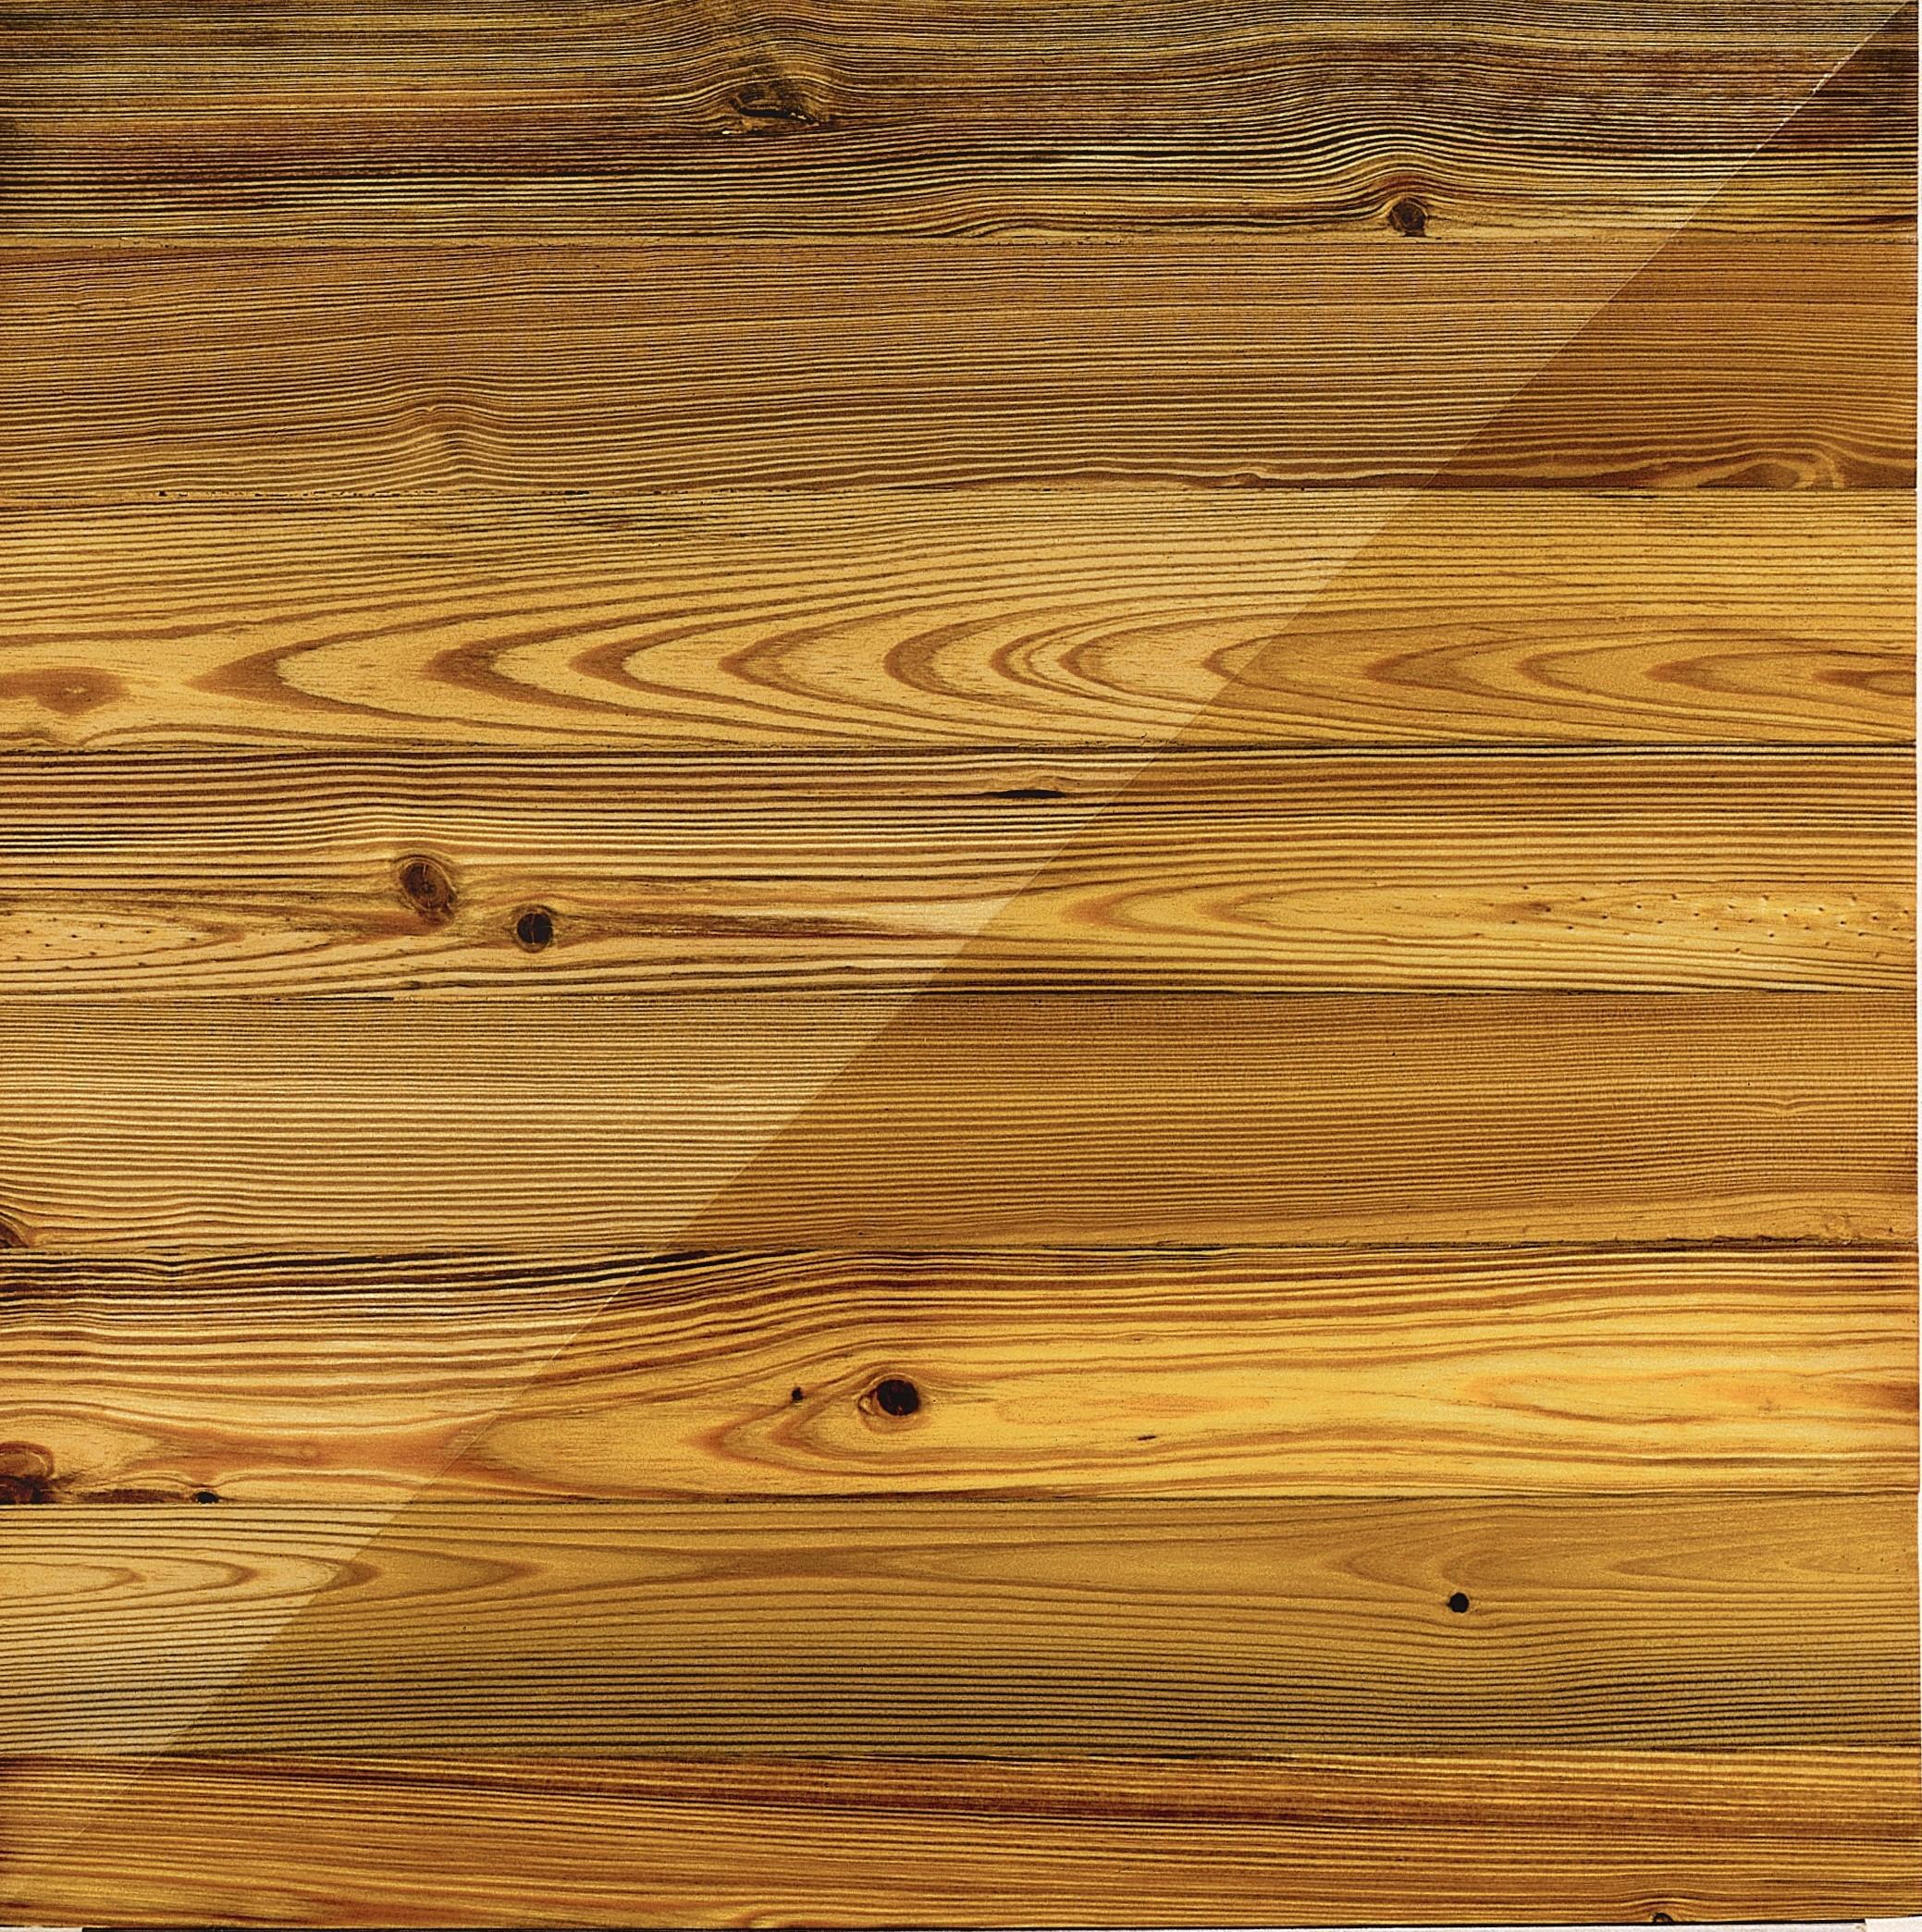 ALL FLOORING  |   reclaimed wood flooring  |  SOLID WOOD PRE-FINISHED  |  ENGINEERED WOOD FLOORING